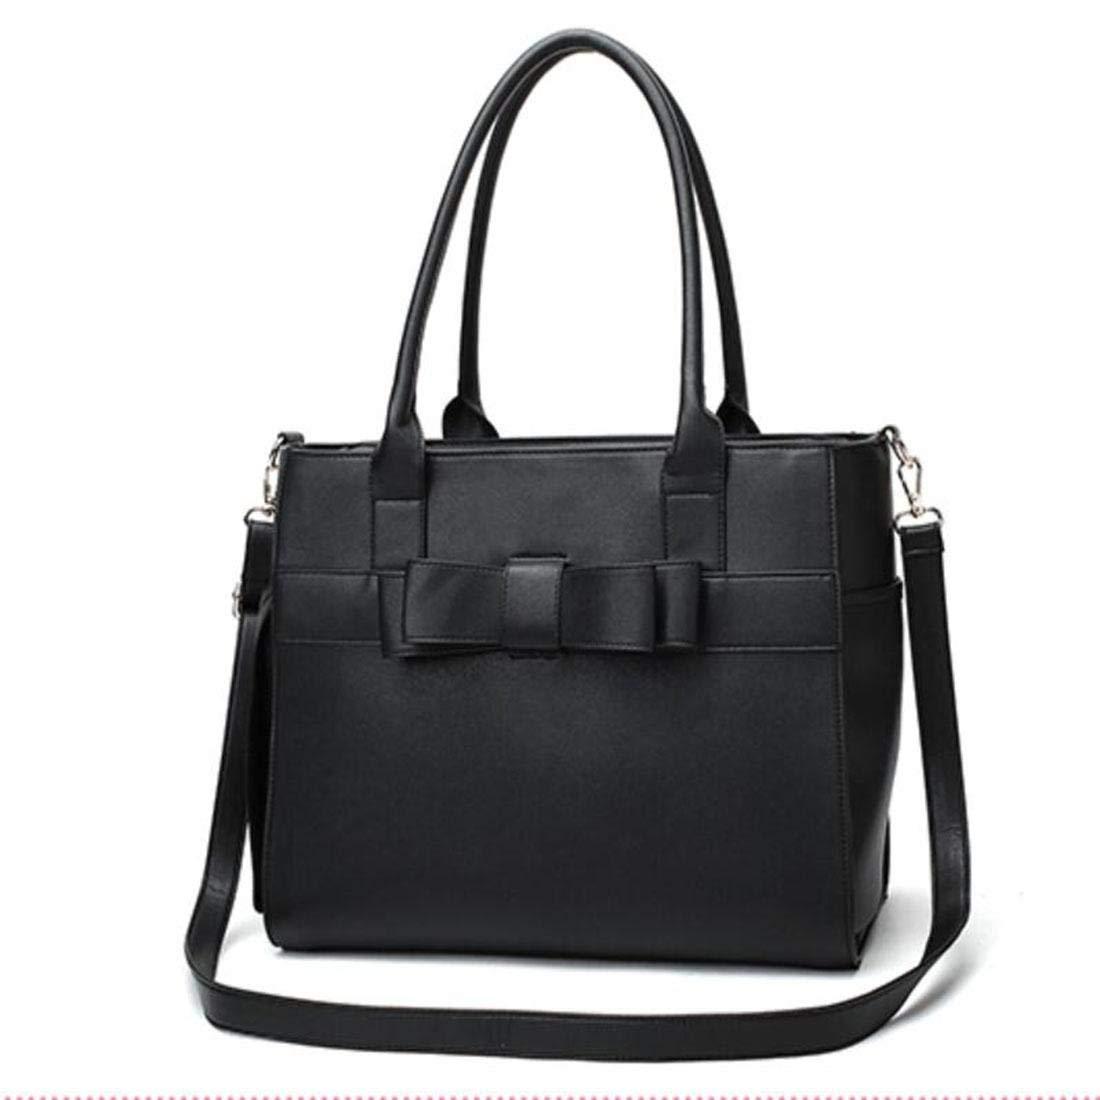 Xinnegen Portable Black PU Leather Dog Carriers Bag Pet Messenger Bag Puppy Handbag Cat Cage Doggy Pouch 41  33  28cm